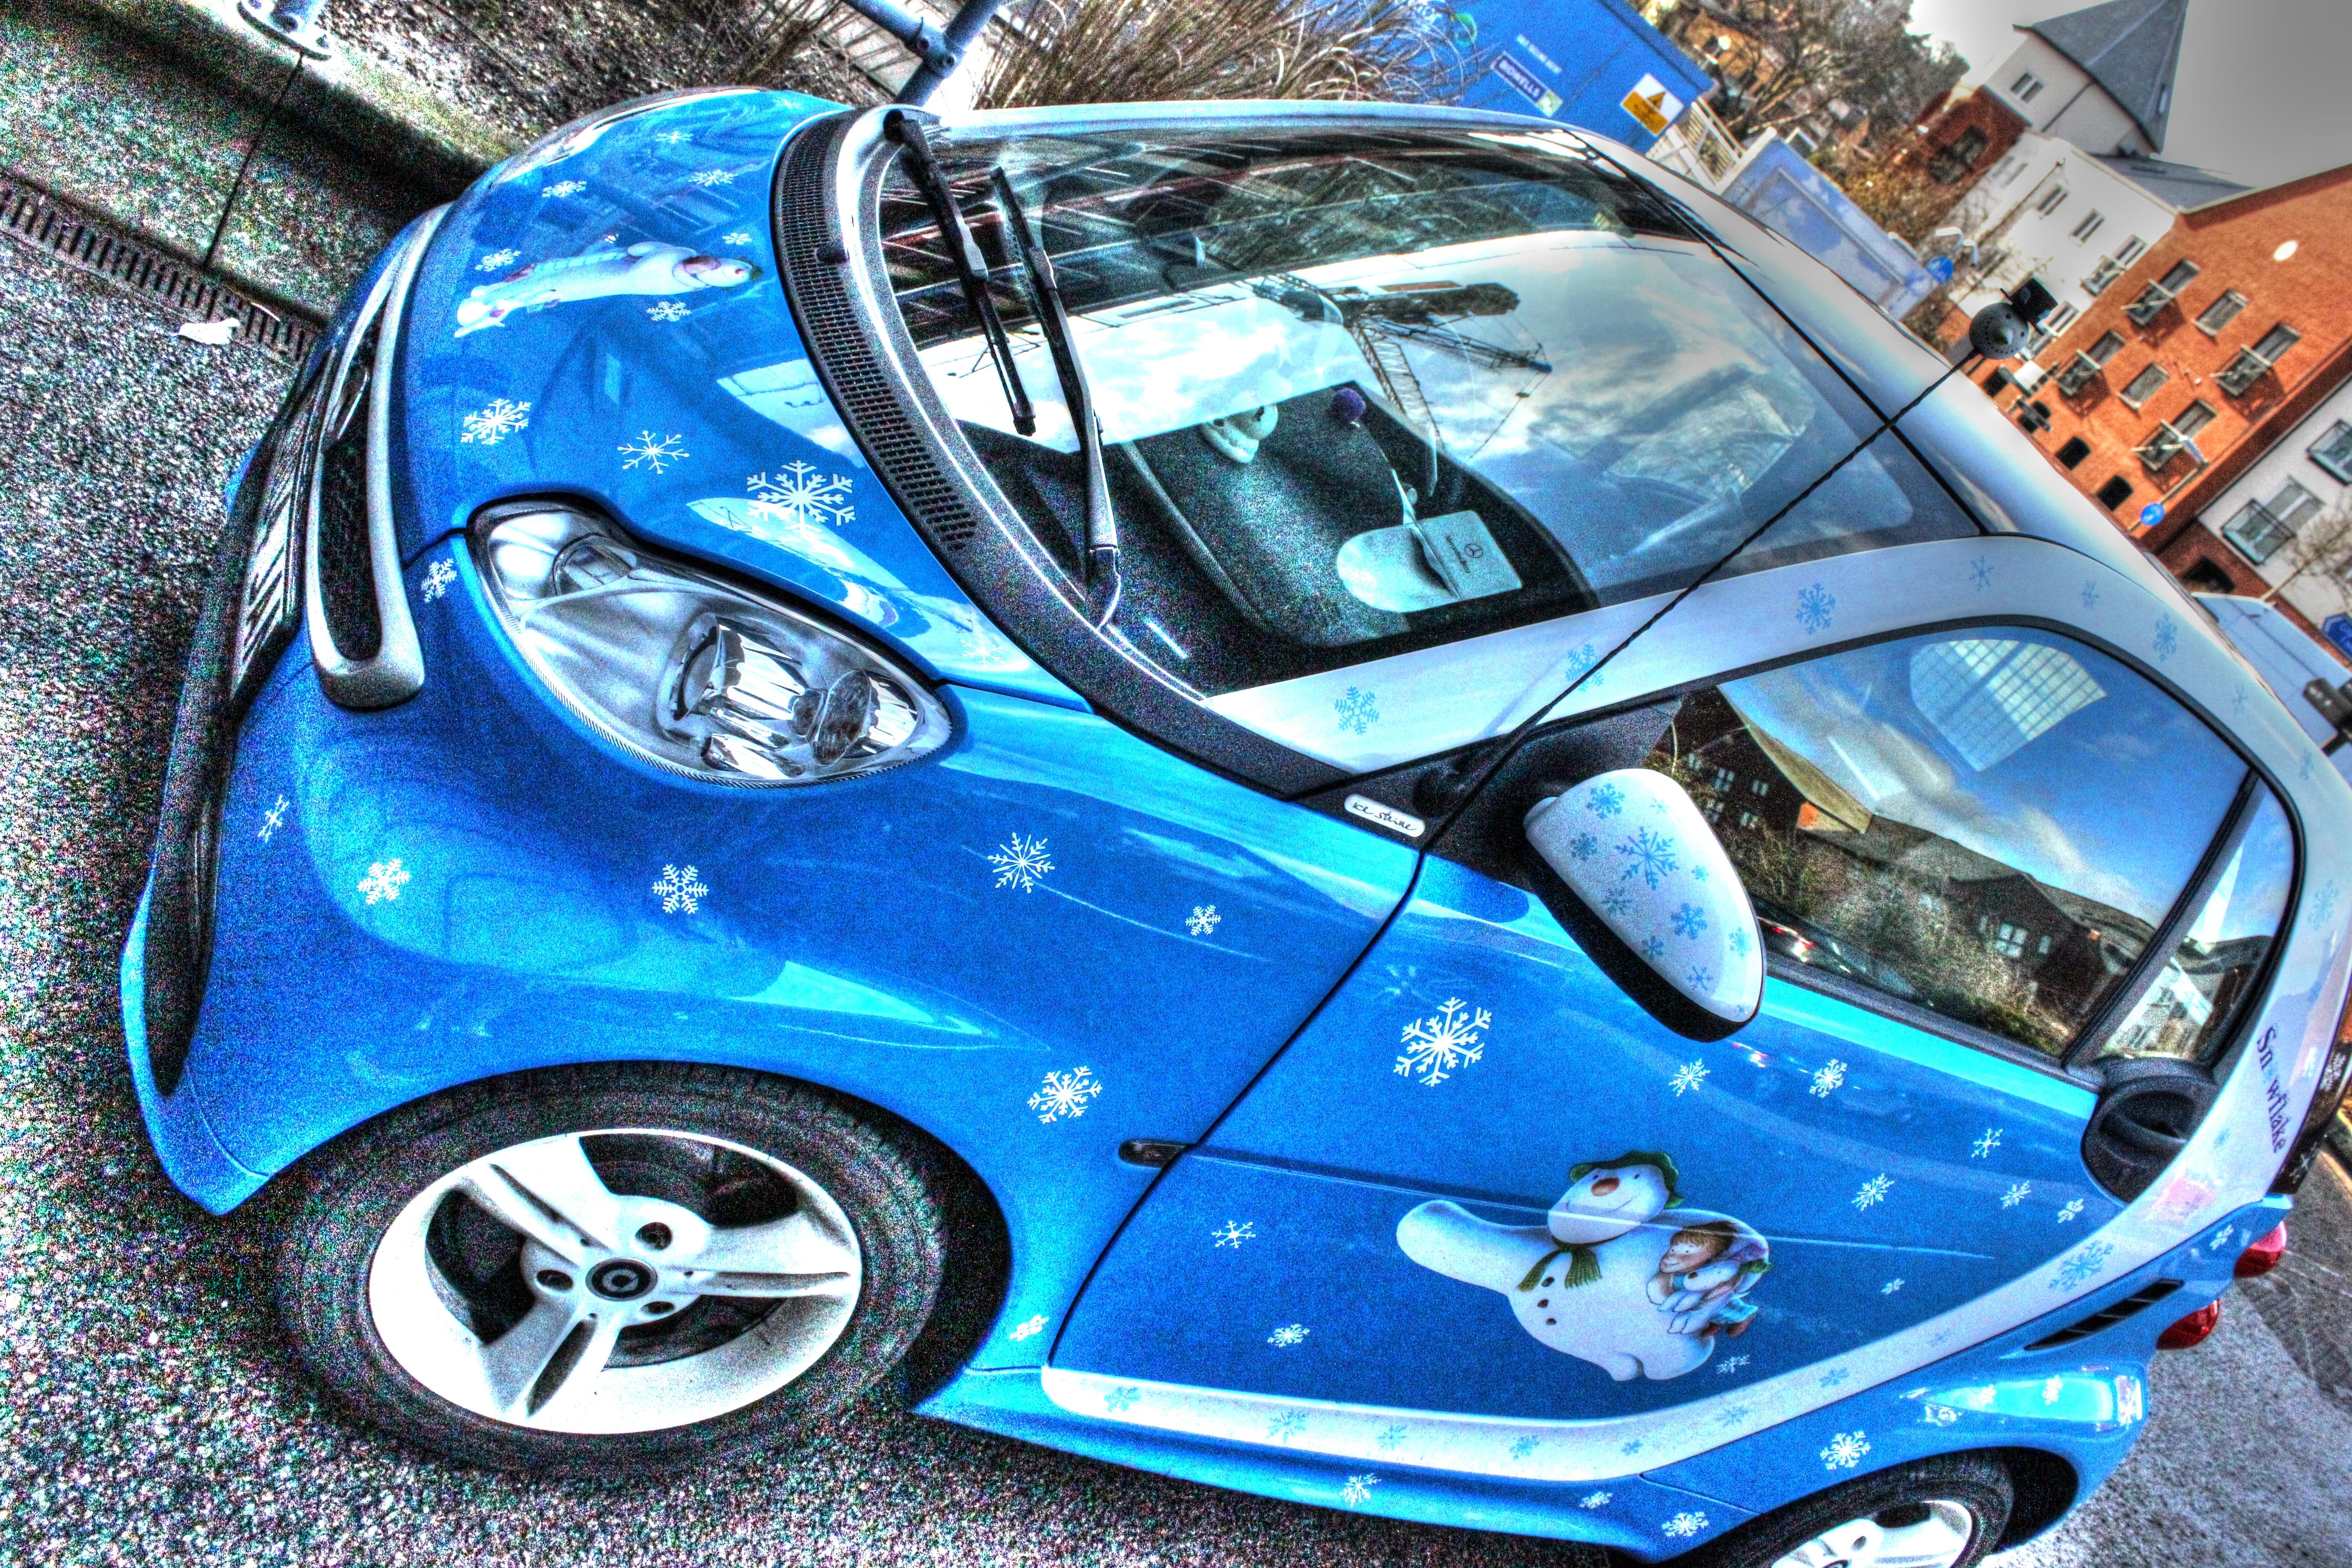 Free Images Wheel Lens Canon Sports Car Race Car Supercar - Eos car show